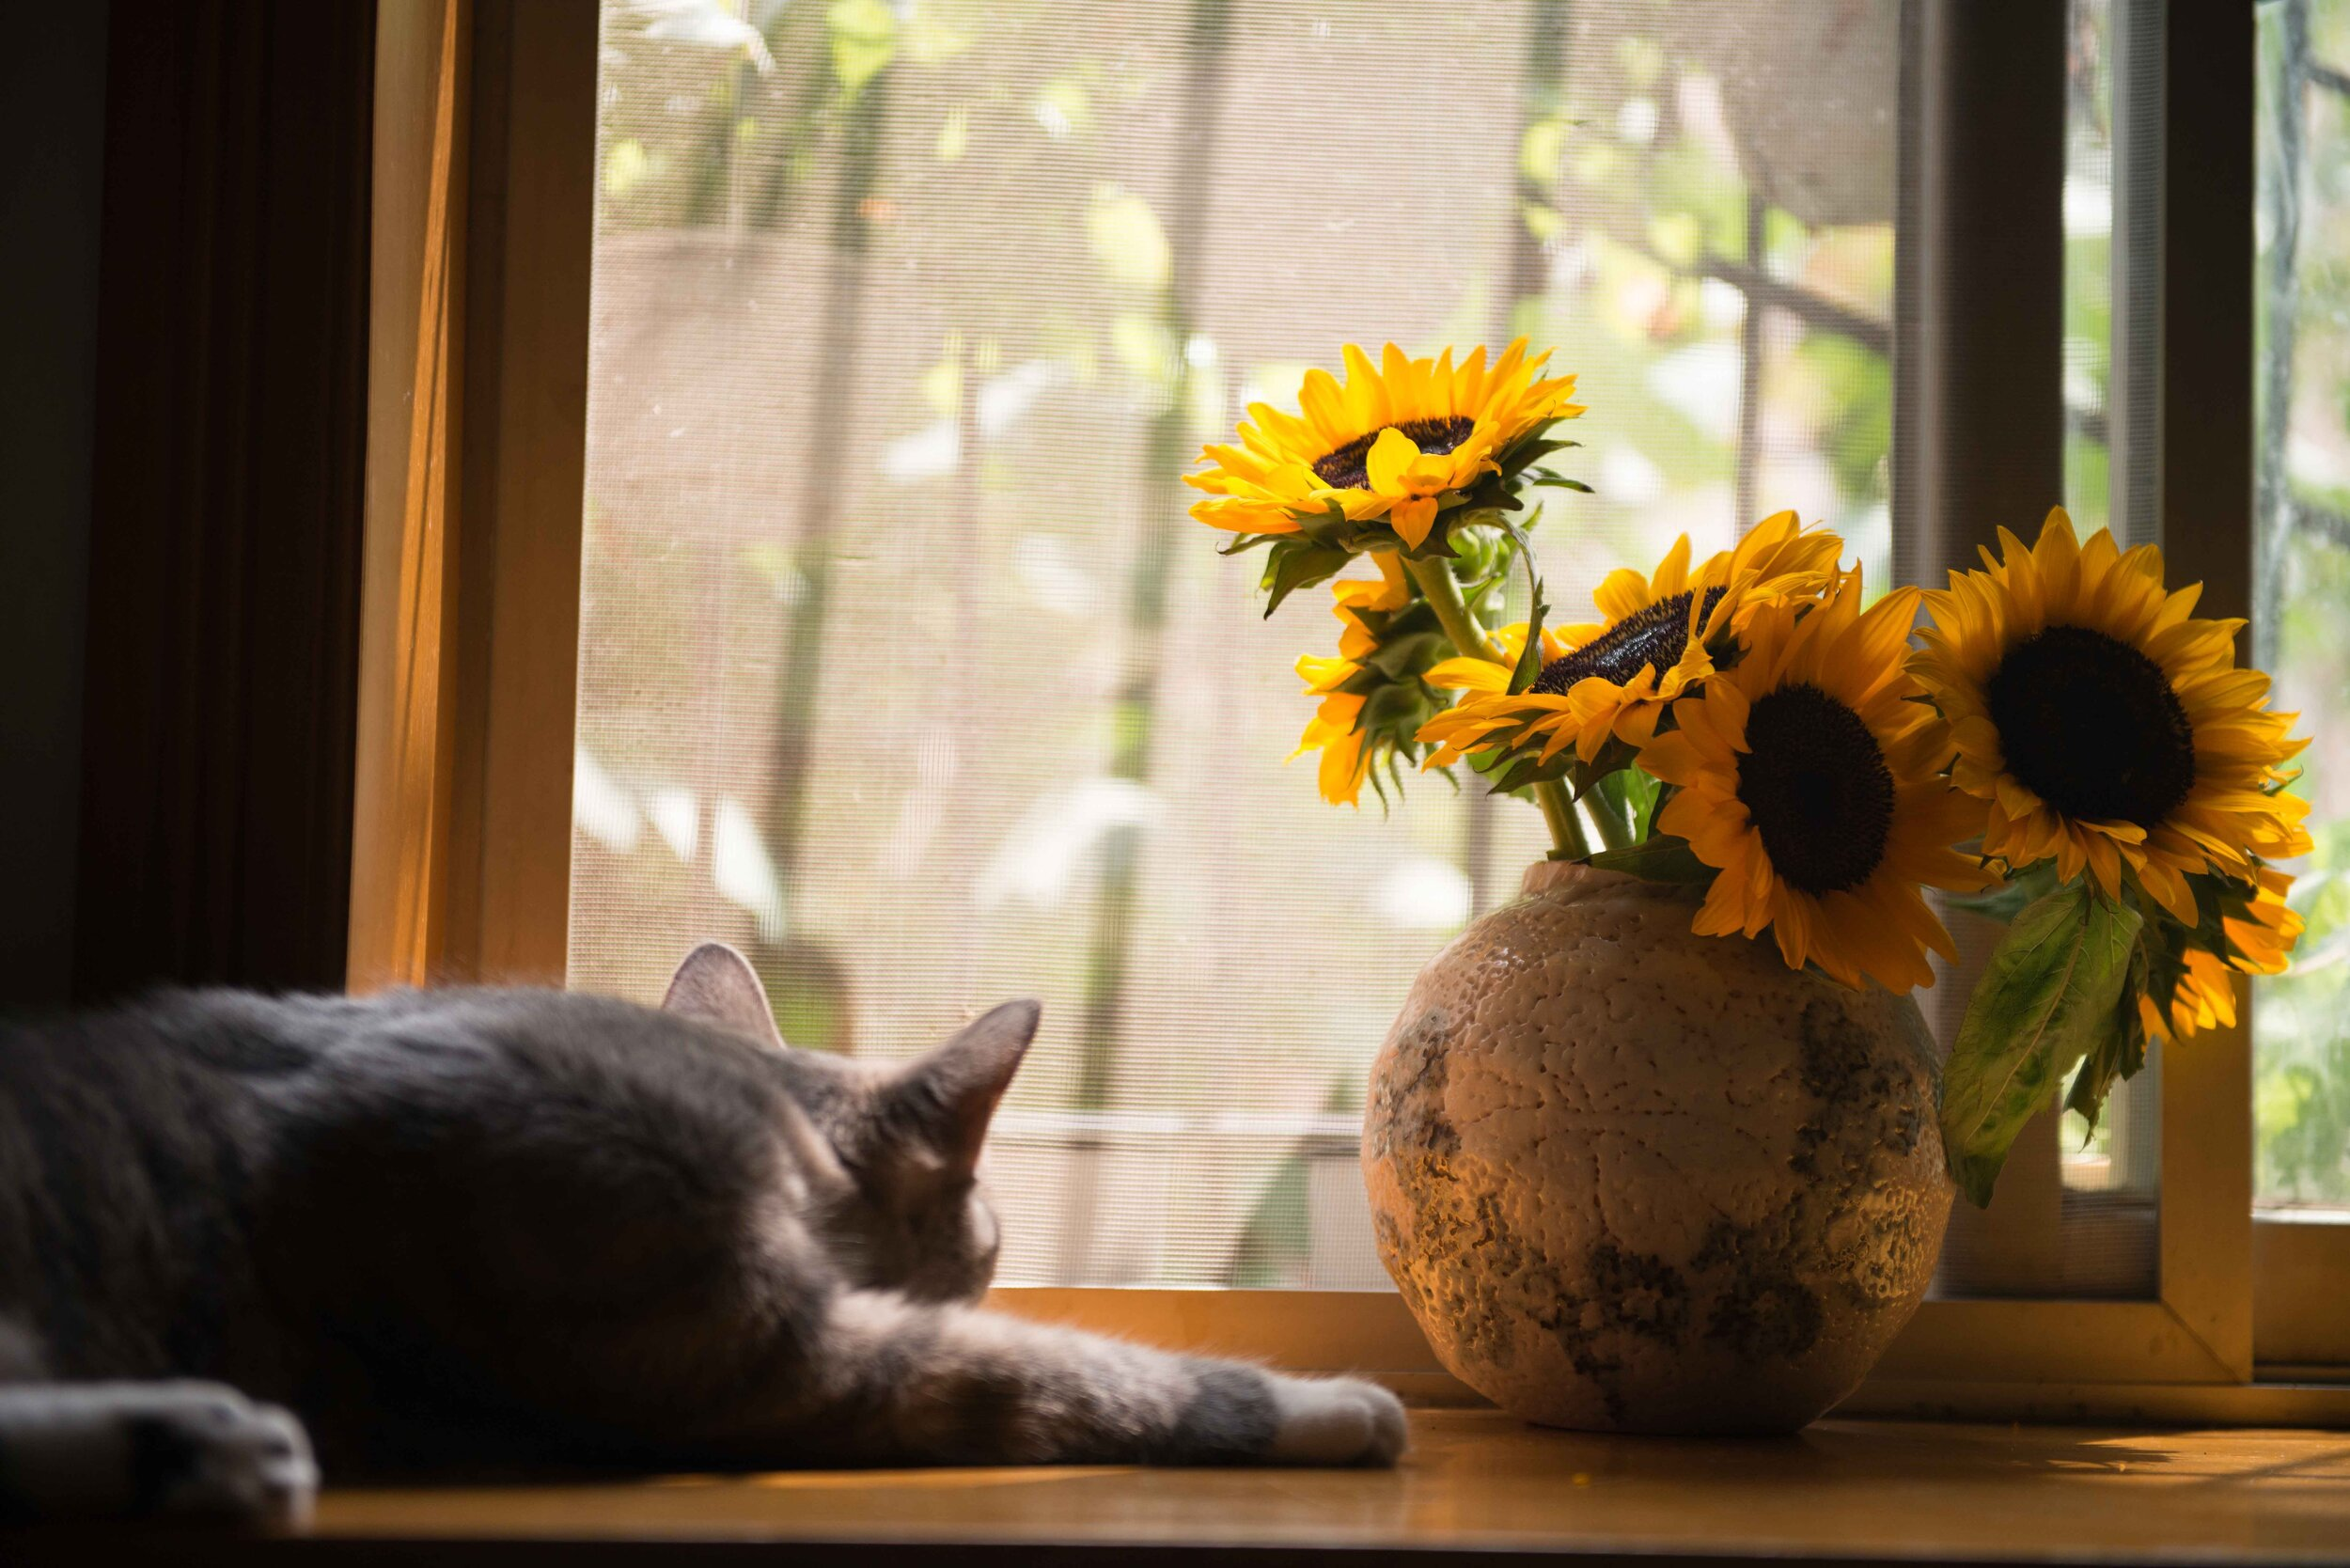 cat-colors-daylight-674580.jpg